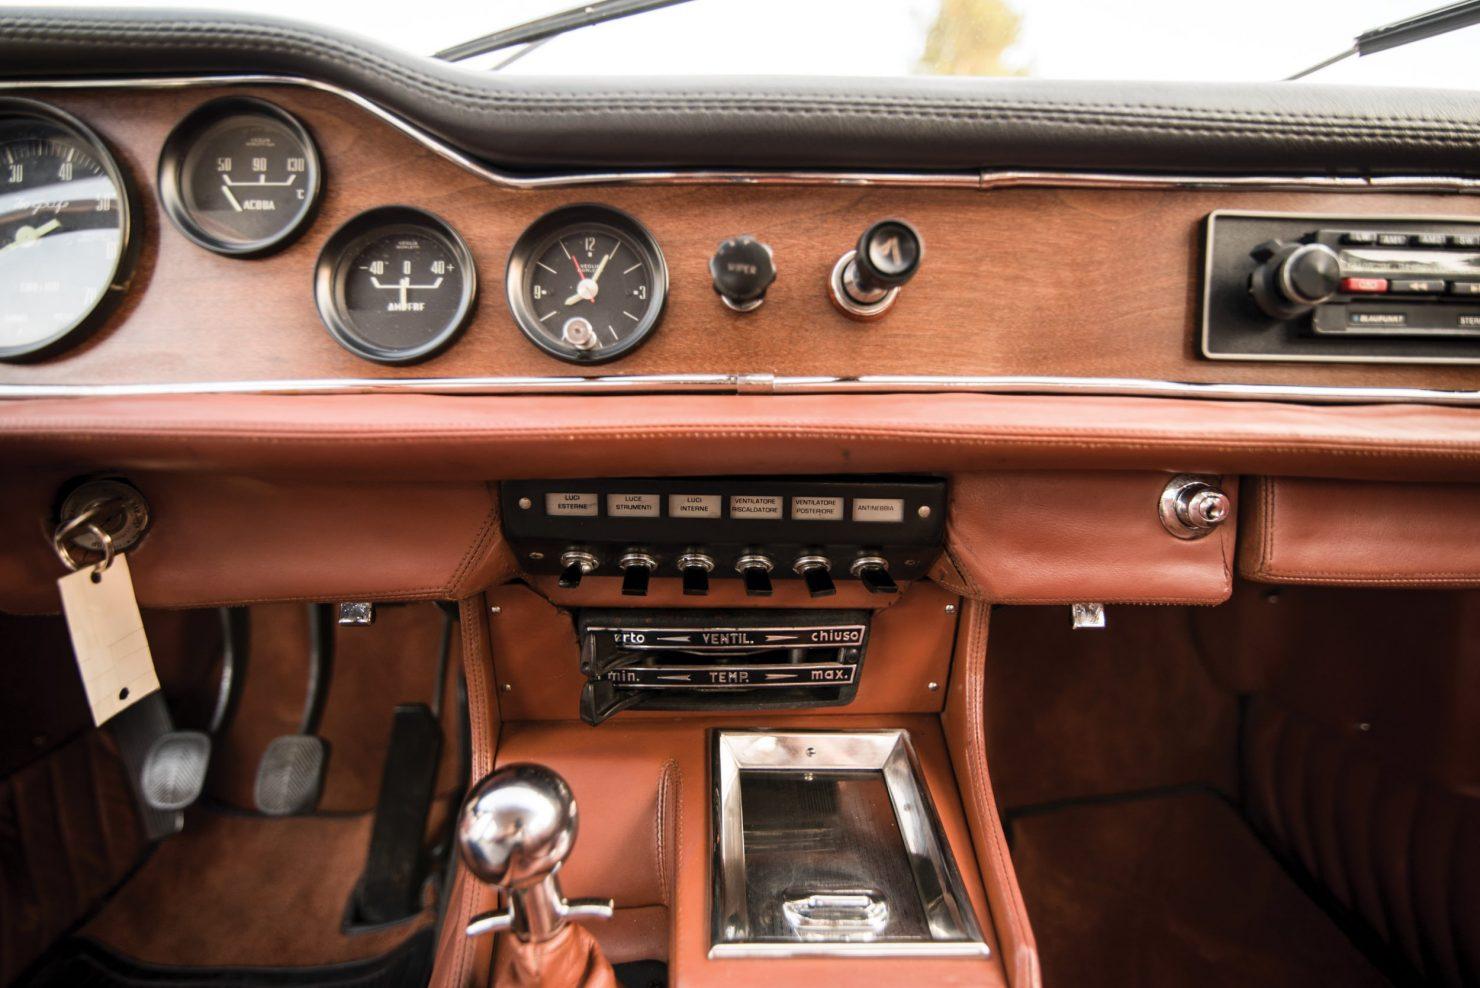 iso grifo car 14 1480x988 - 1966 Iso Grifo GL Series I